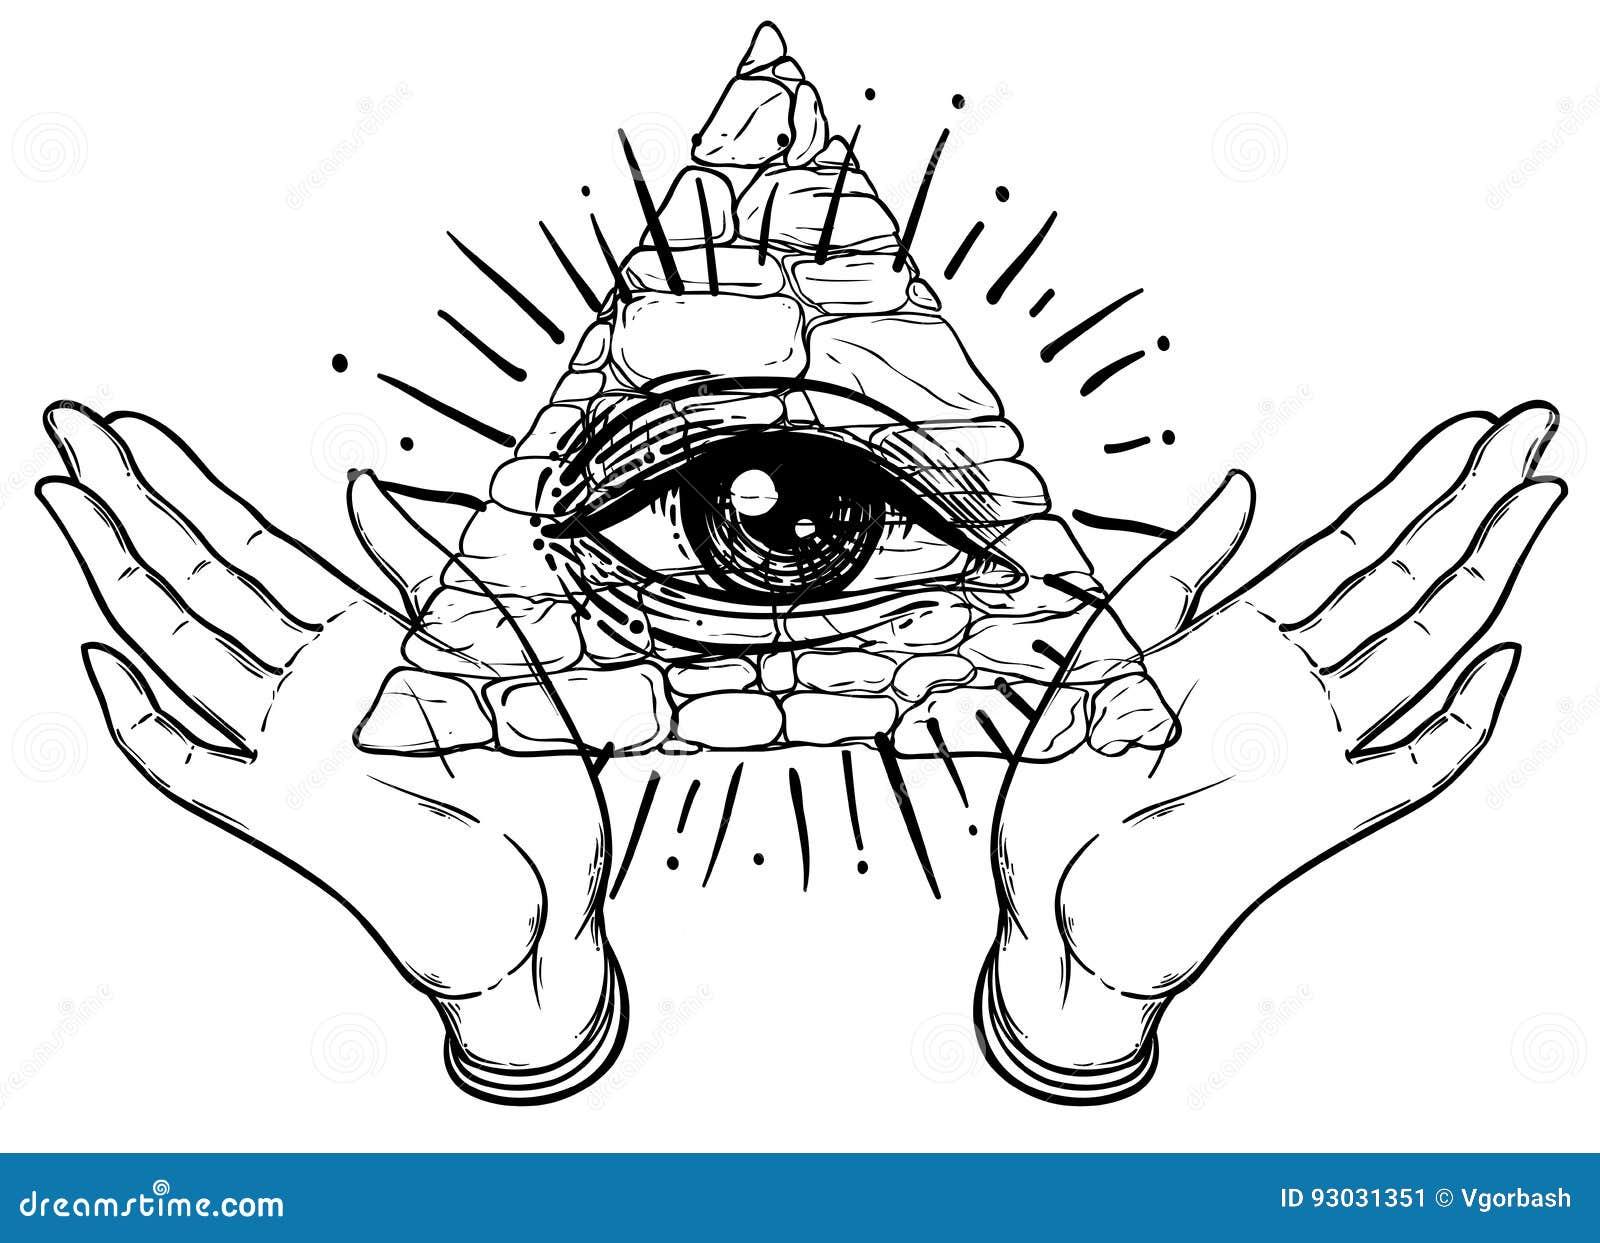 Masonic stock illustrations 4660 masonic stock illustrations female hands open around masonic symbol new world order hand d rawn buycottarizona Images